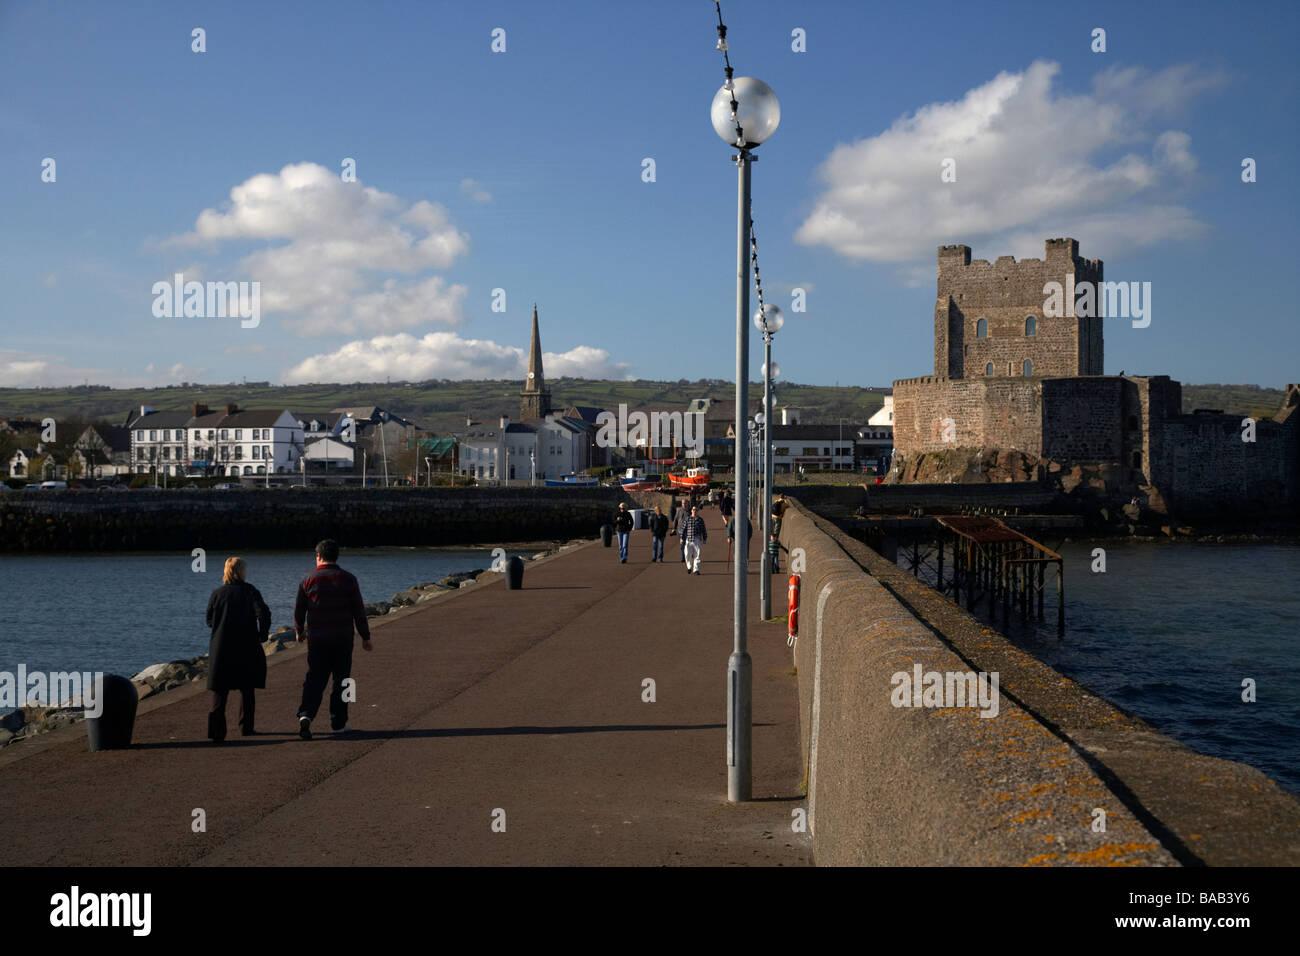 carrickfergus harbour and albert edward pier promenade and castle county antrim northern ireland uk - Stock Image